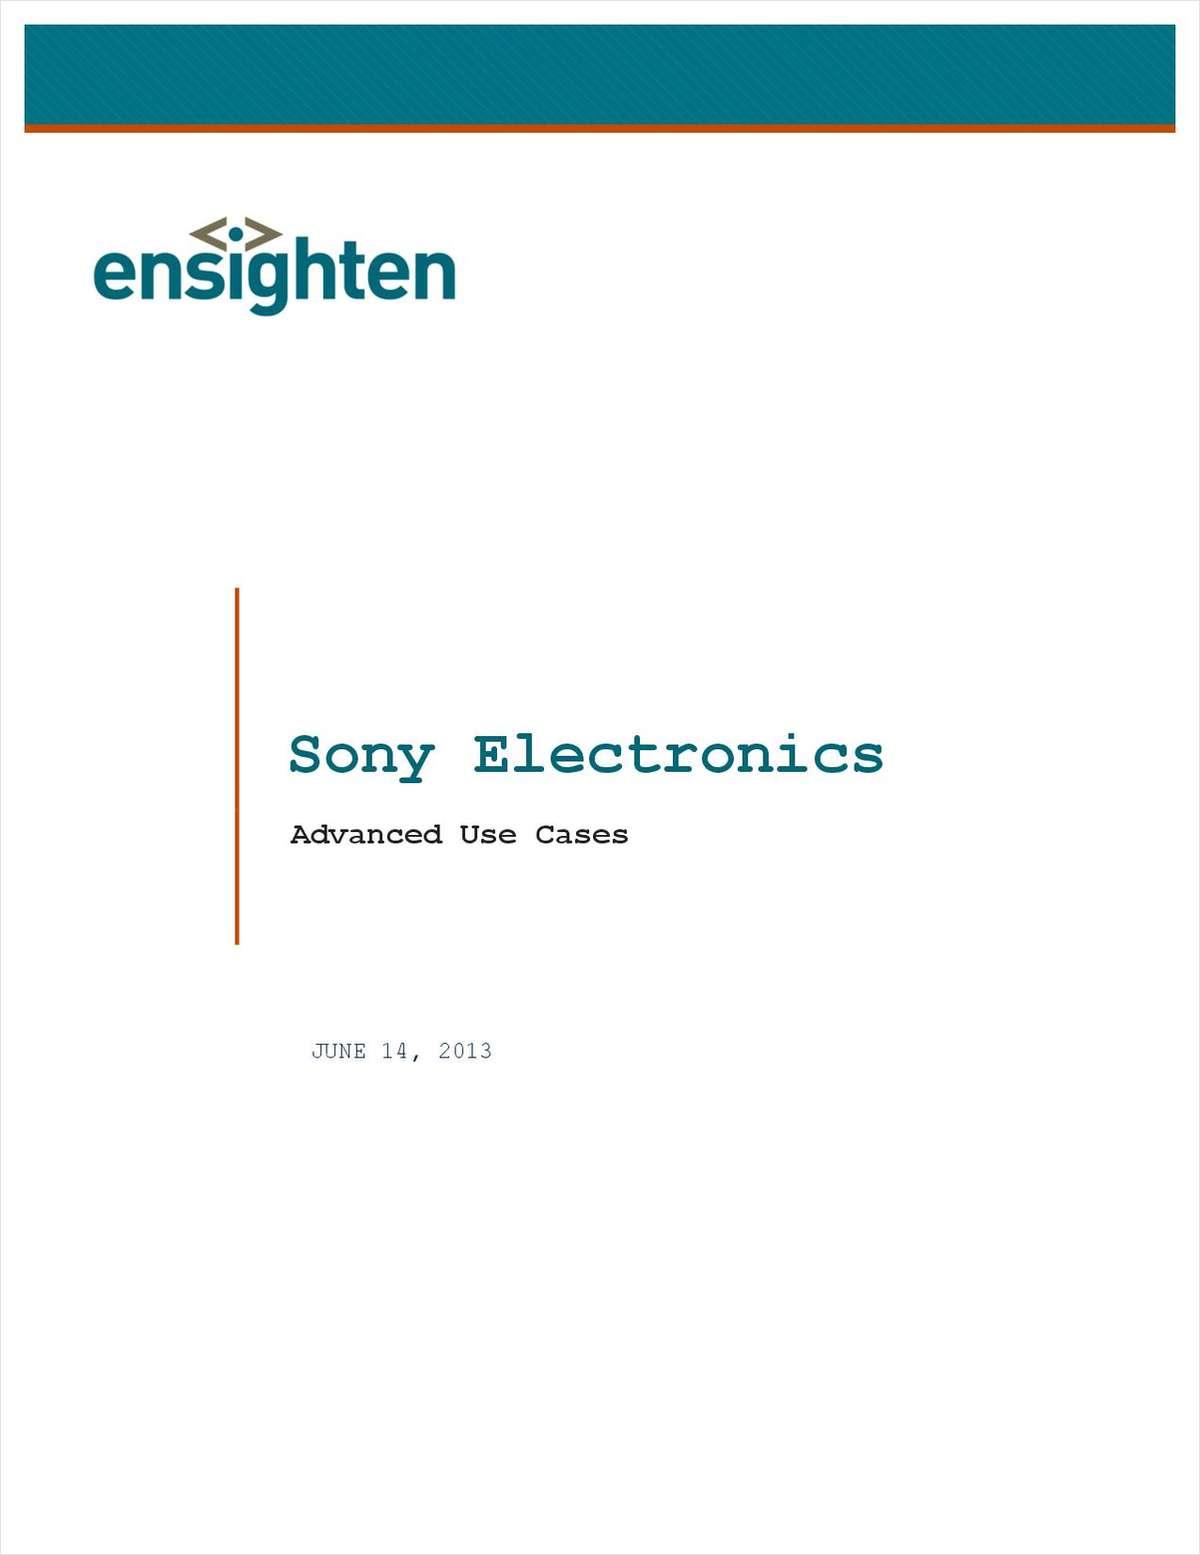 Advance Use Case: Sony Electronics